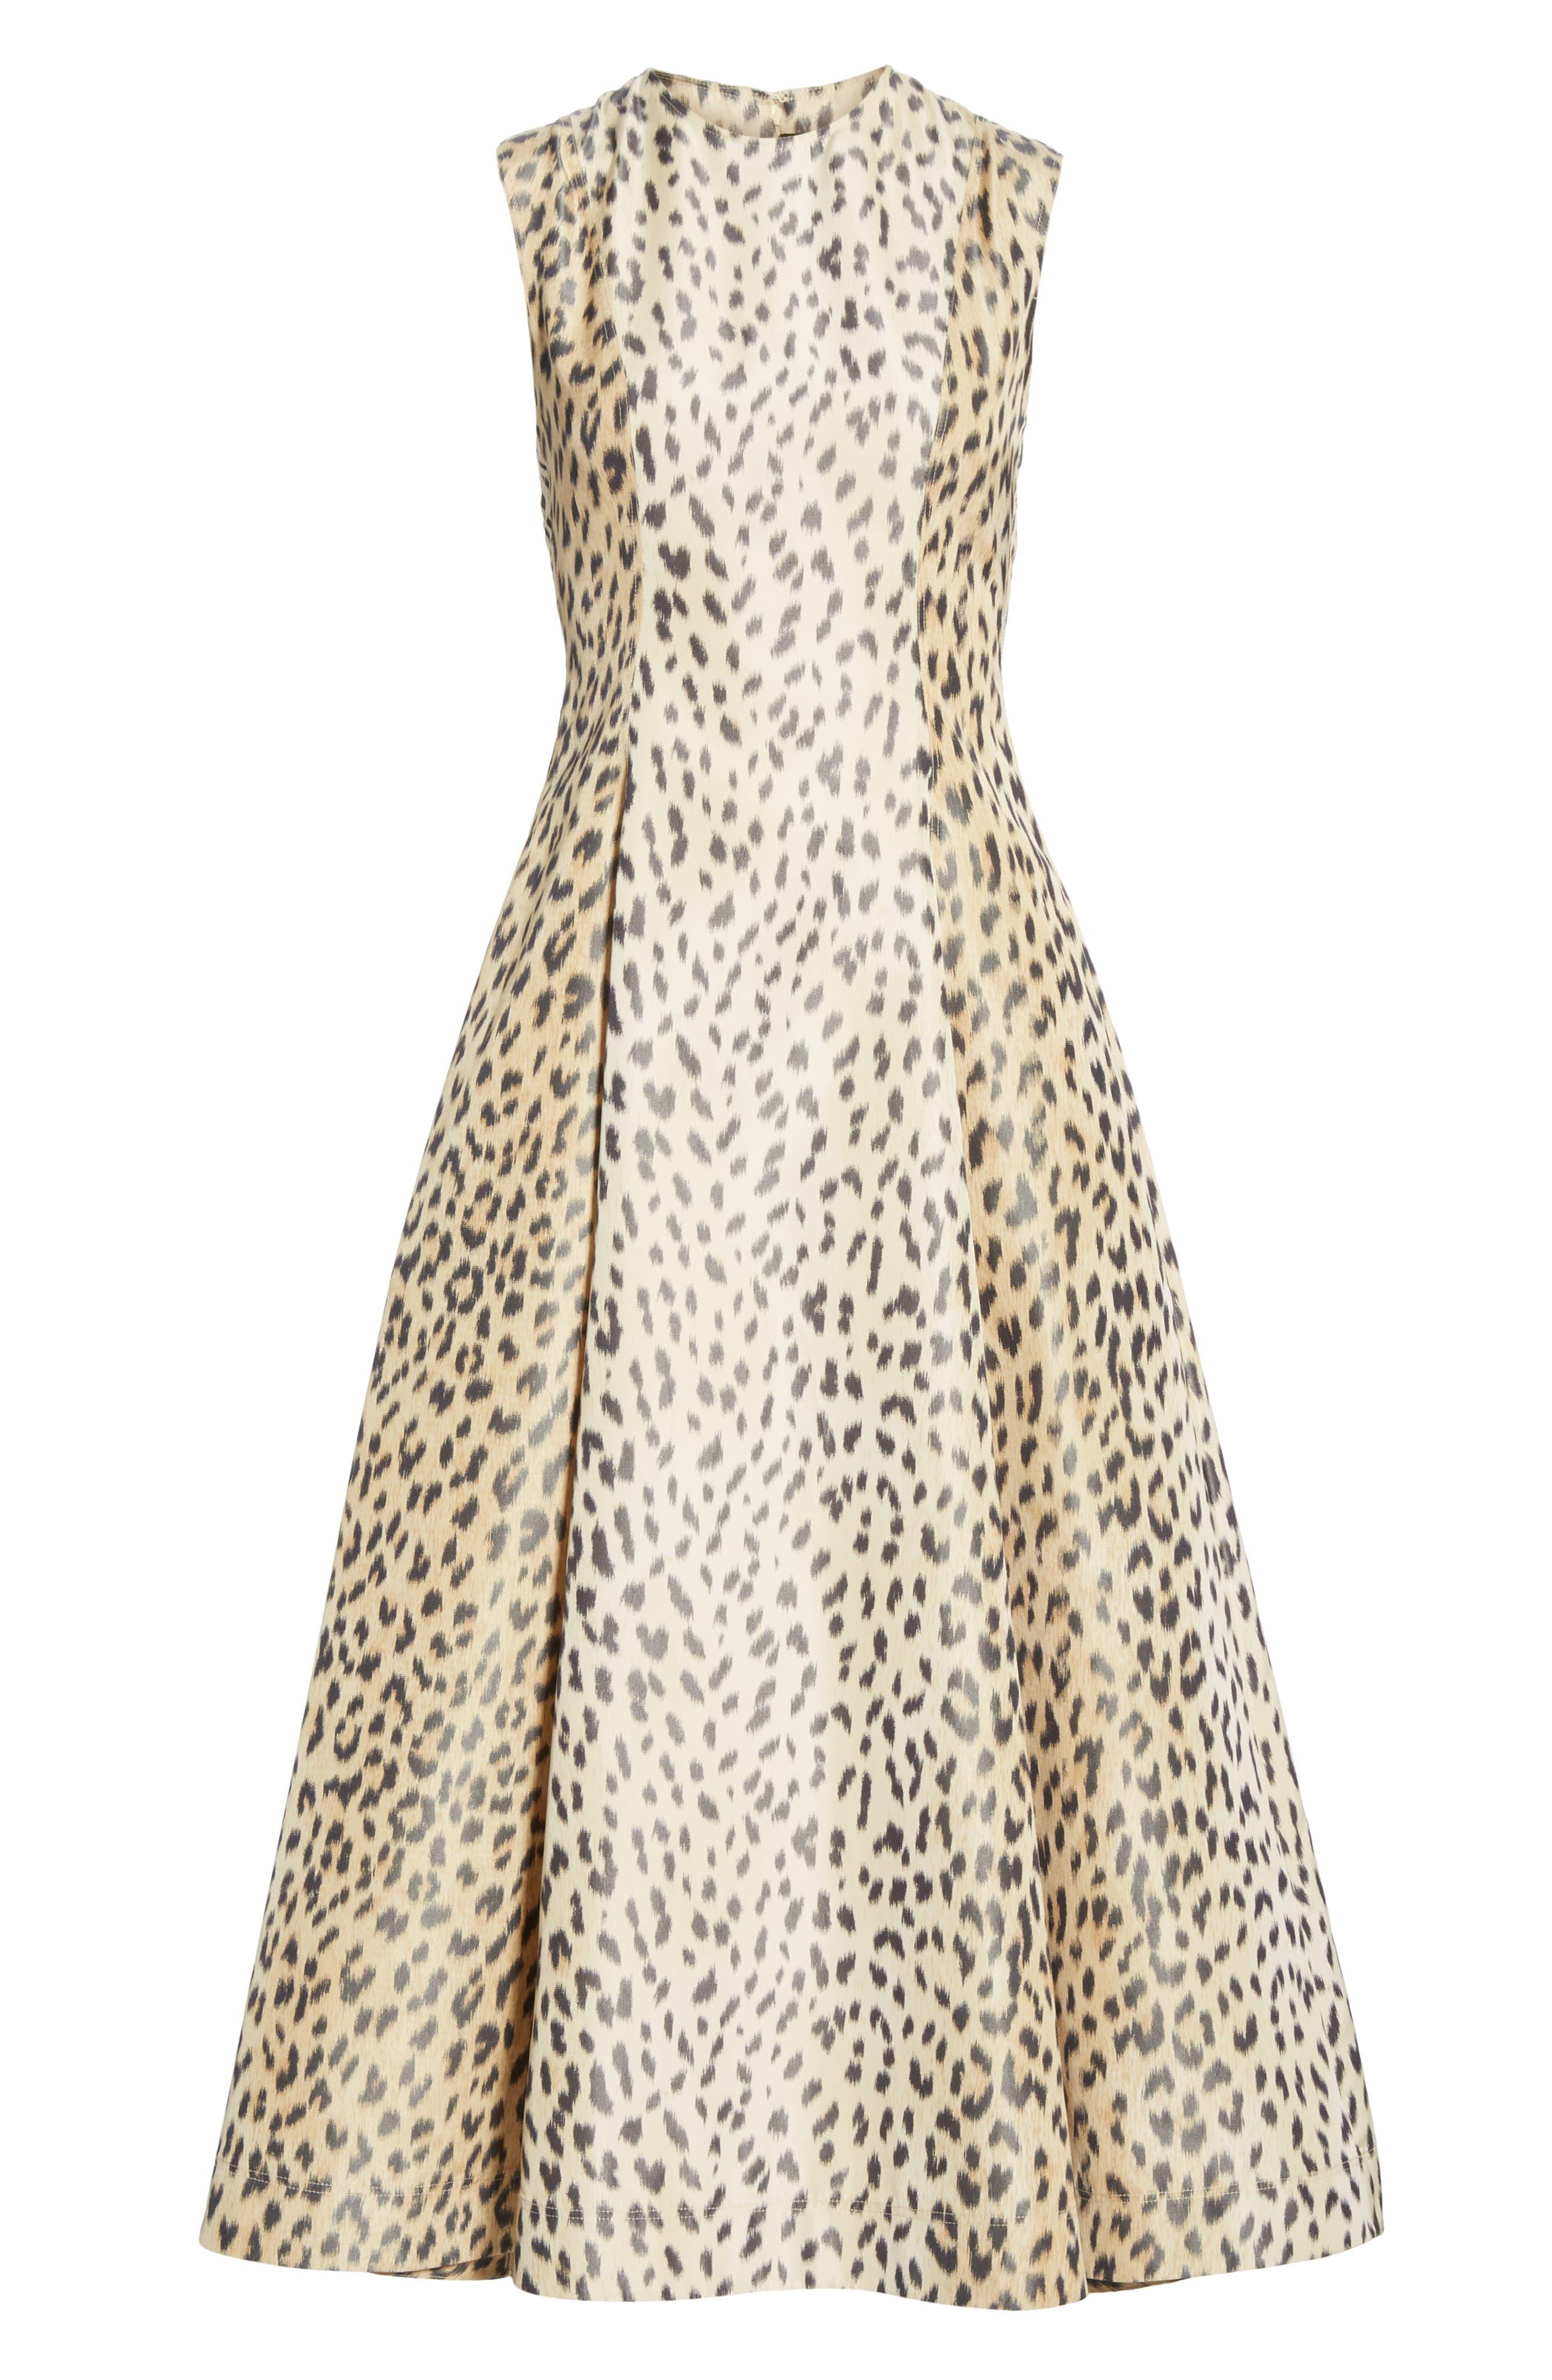 6c712281fe2 Women s CALVIN KLEIN 205W39NYC Designer Dresses